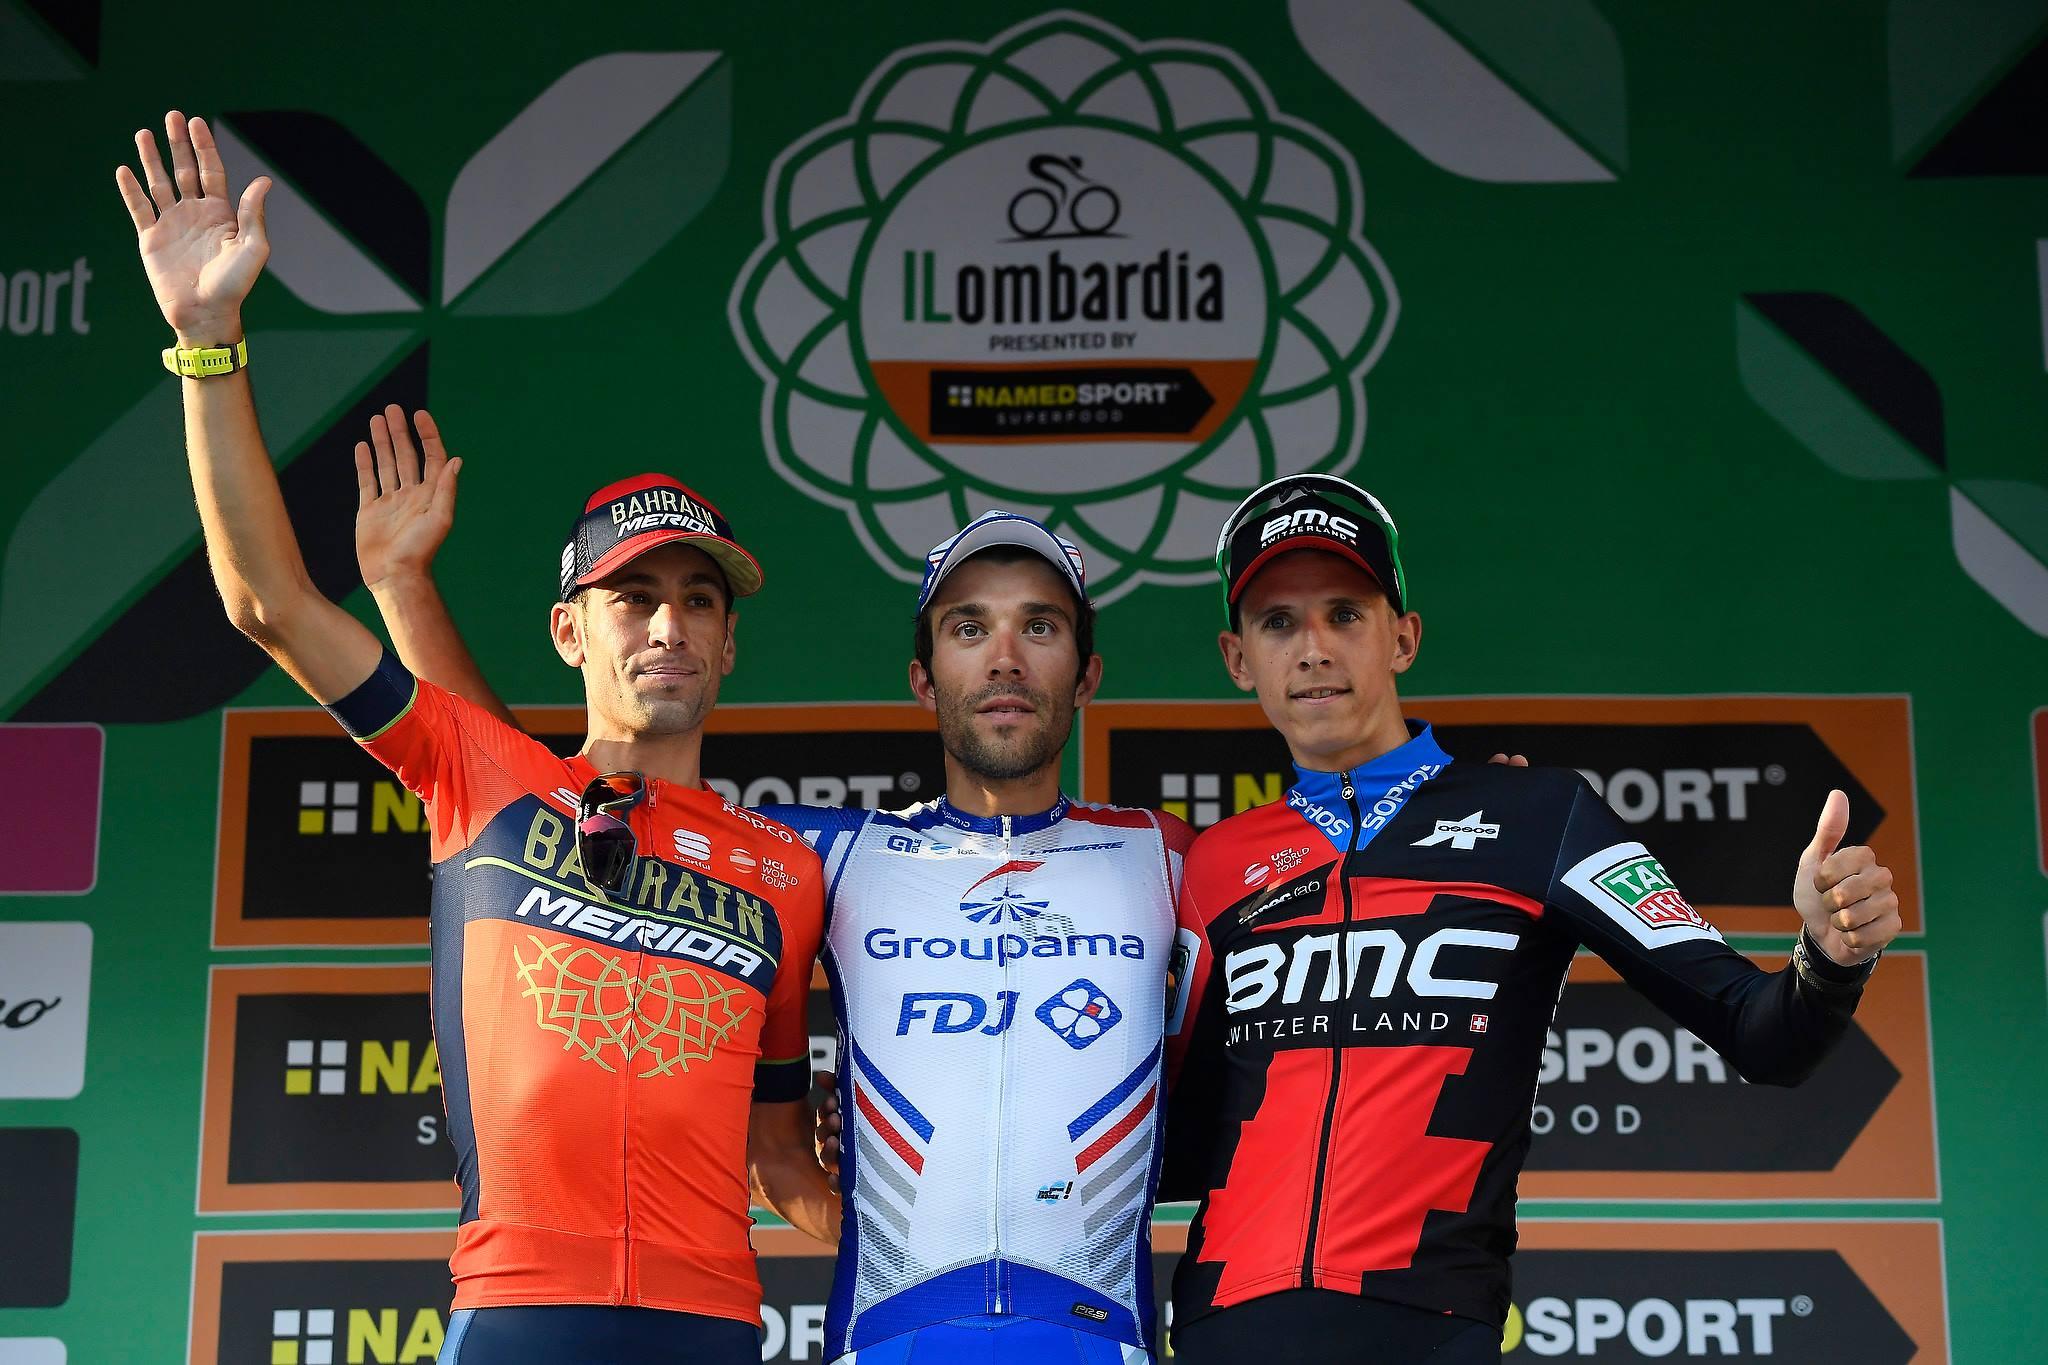 Тибо Пино выиграл велогонку «Джиро ди Ломбардия»